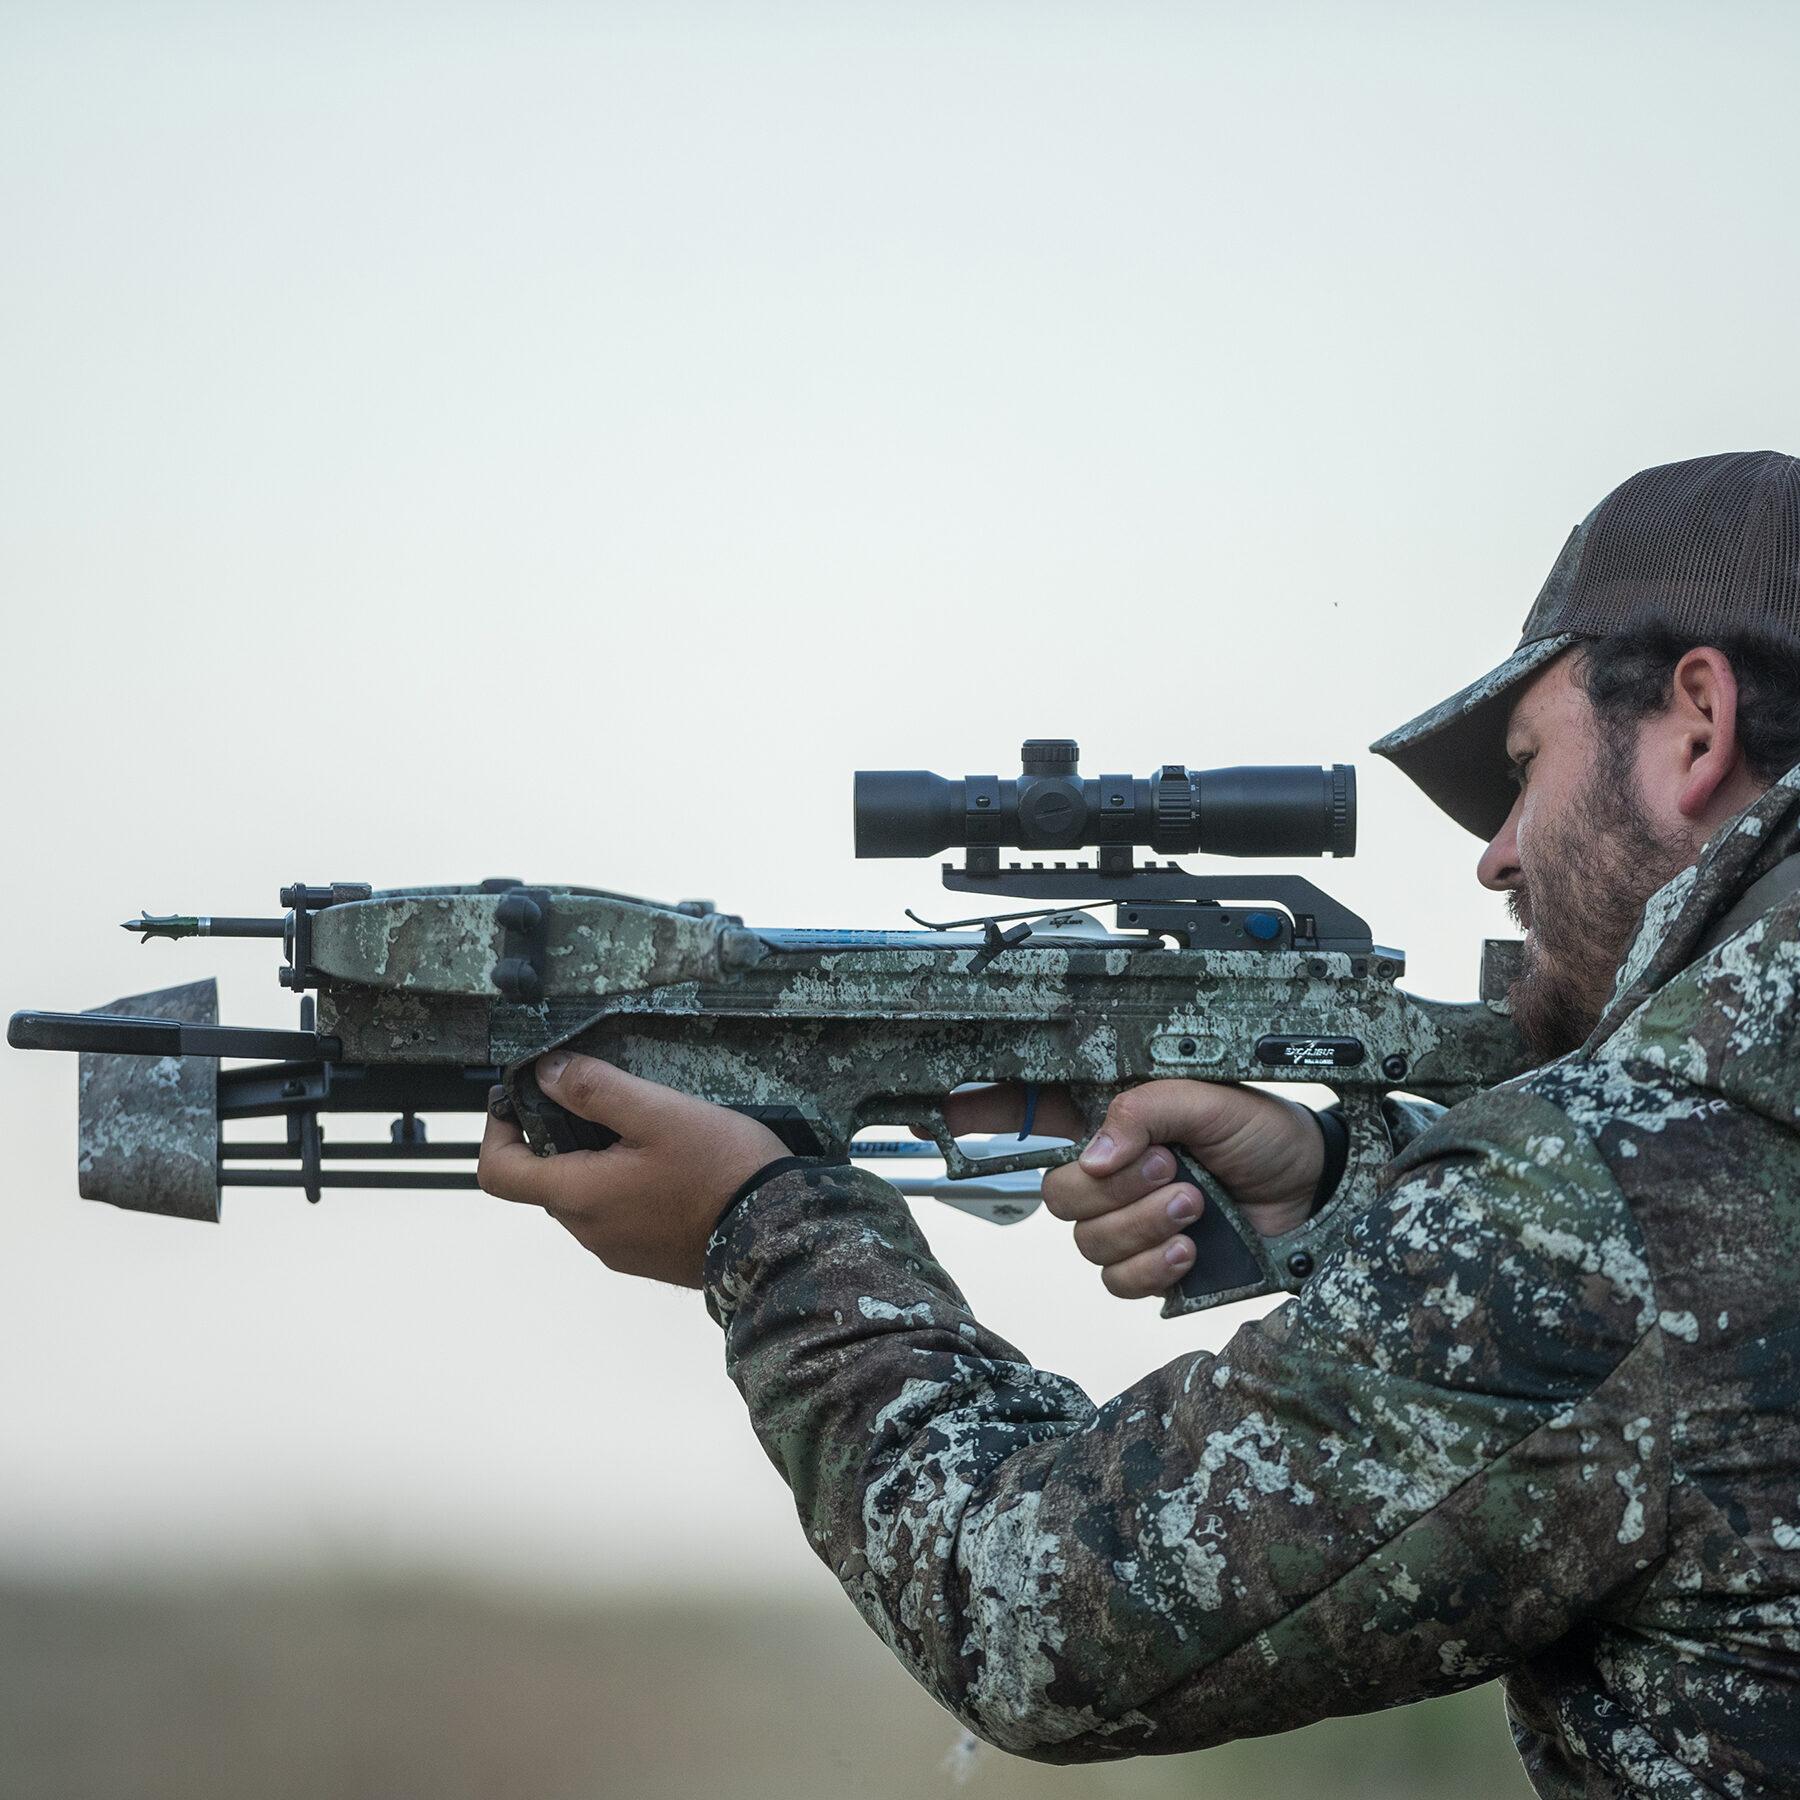 vista lateral de hunter apuntando al assassin 400